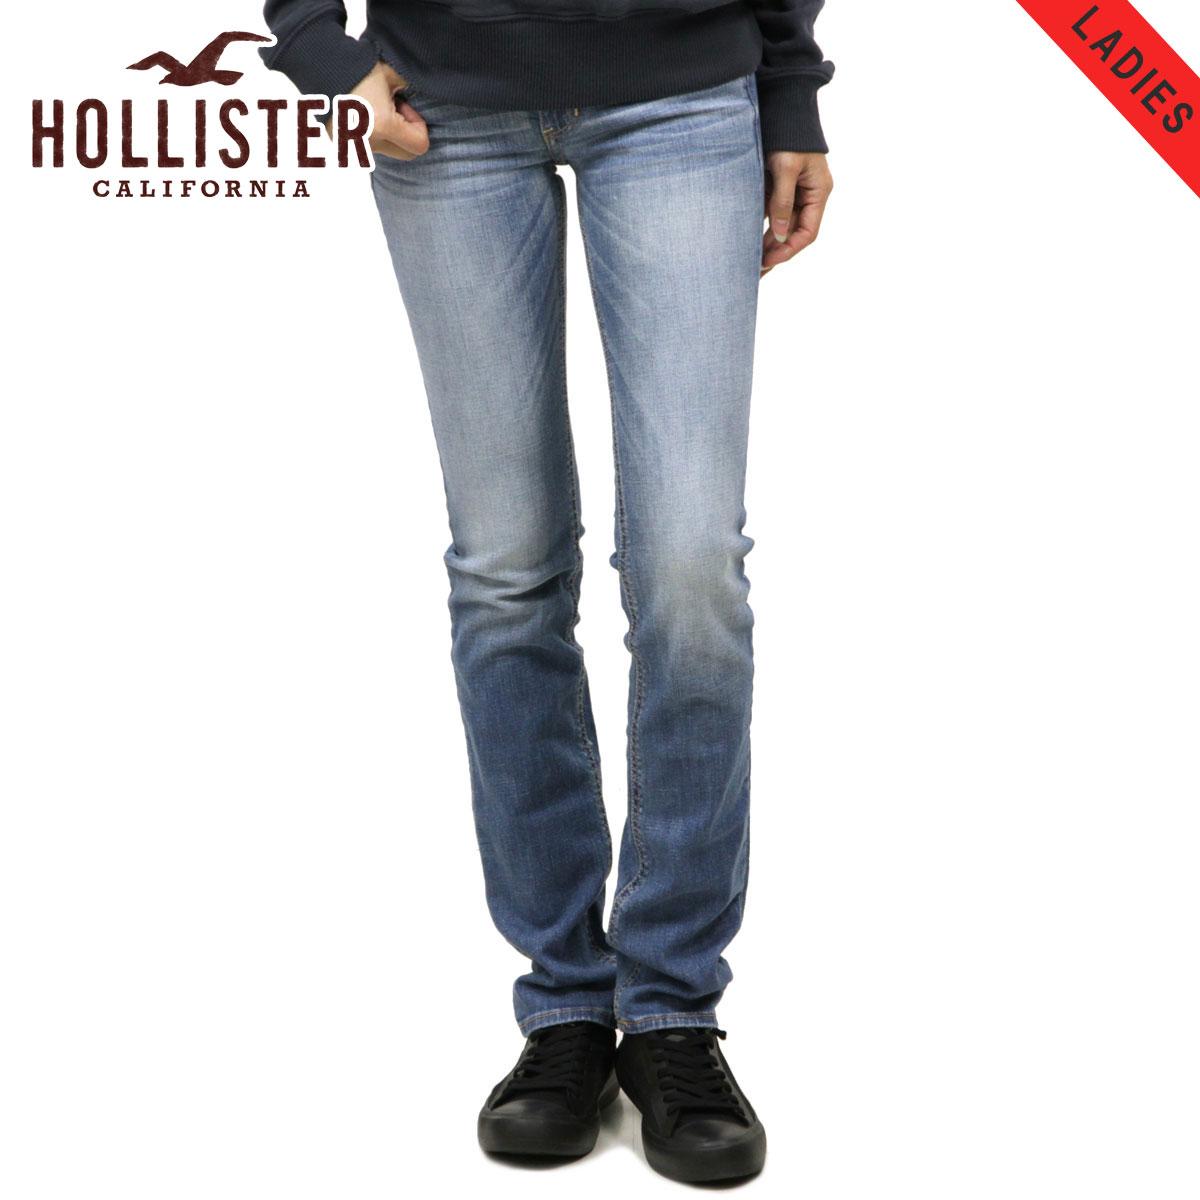 Hollister HOLLISTER AE Womens Jeans Bryden Skinny MEDIUM WASH 355 550 0201 024